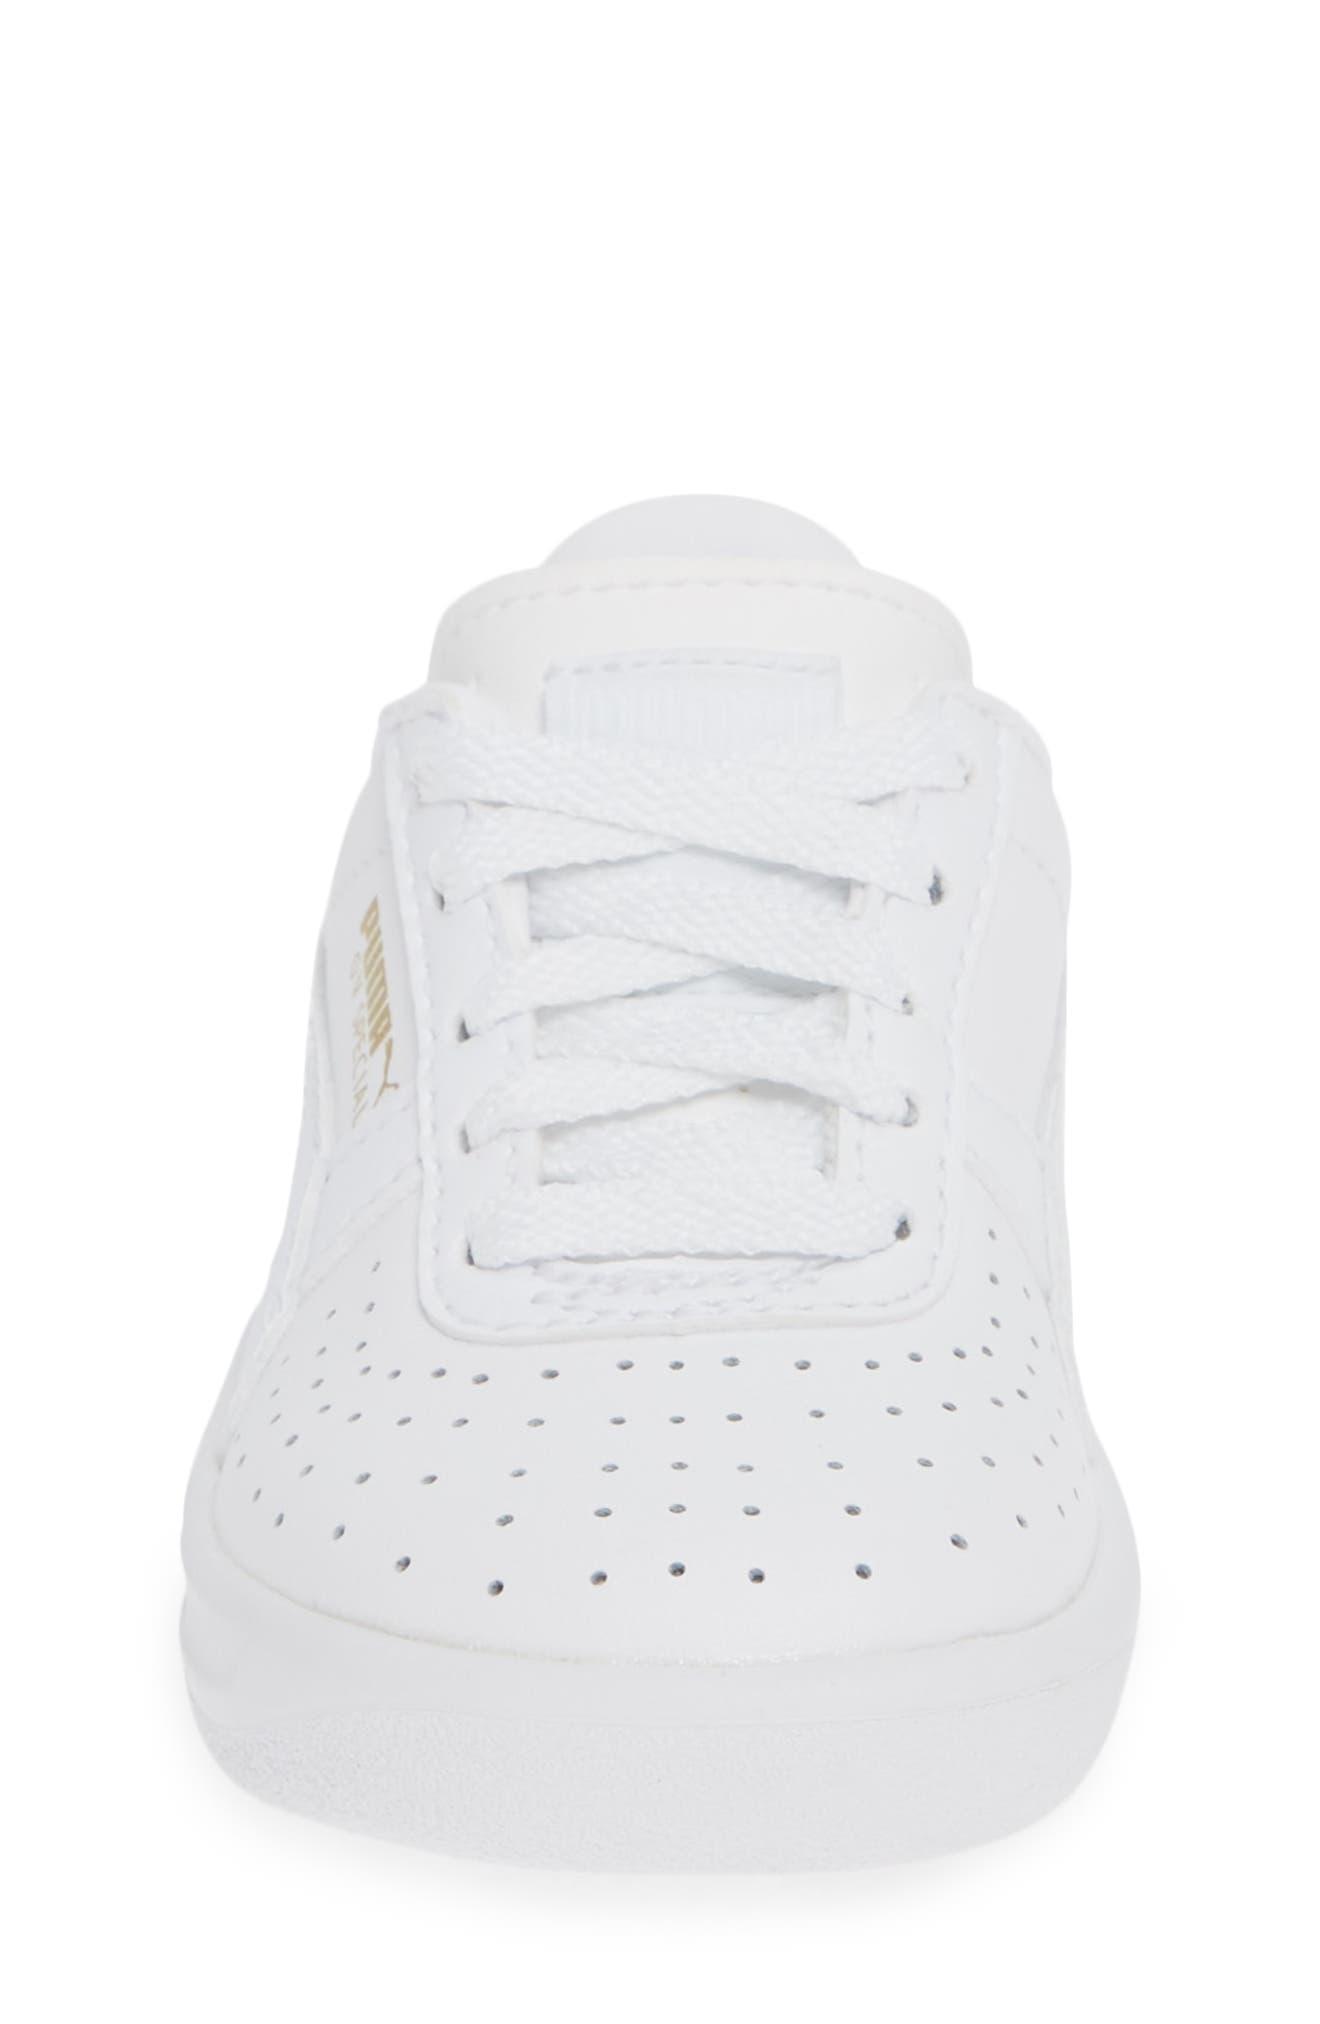 GV Special Sneaker,                             Alternate thumbnail 4, color,                             PUMA WHITE-PUMA TEAM GOLD